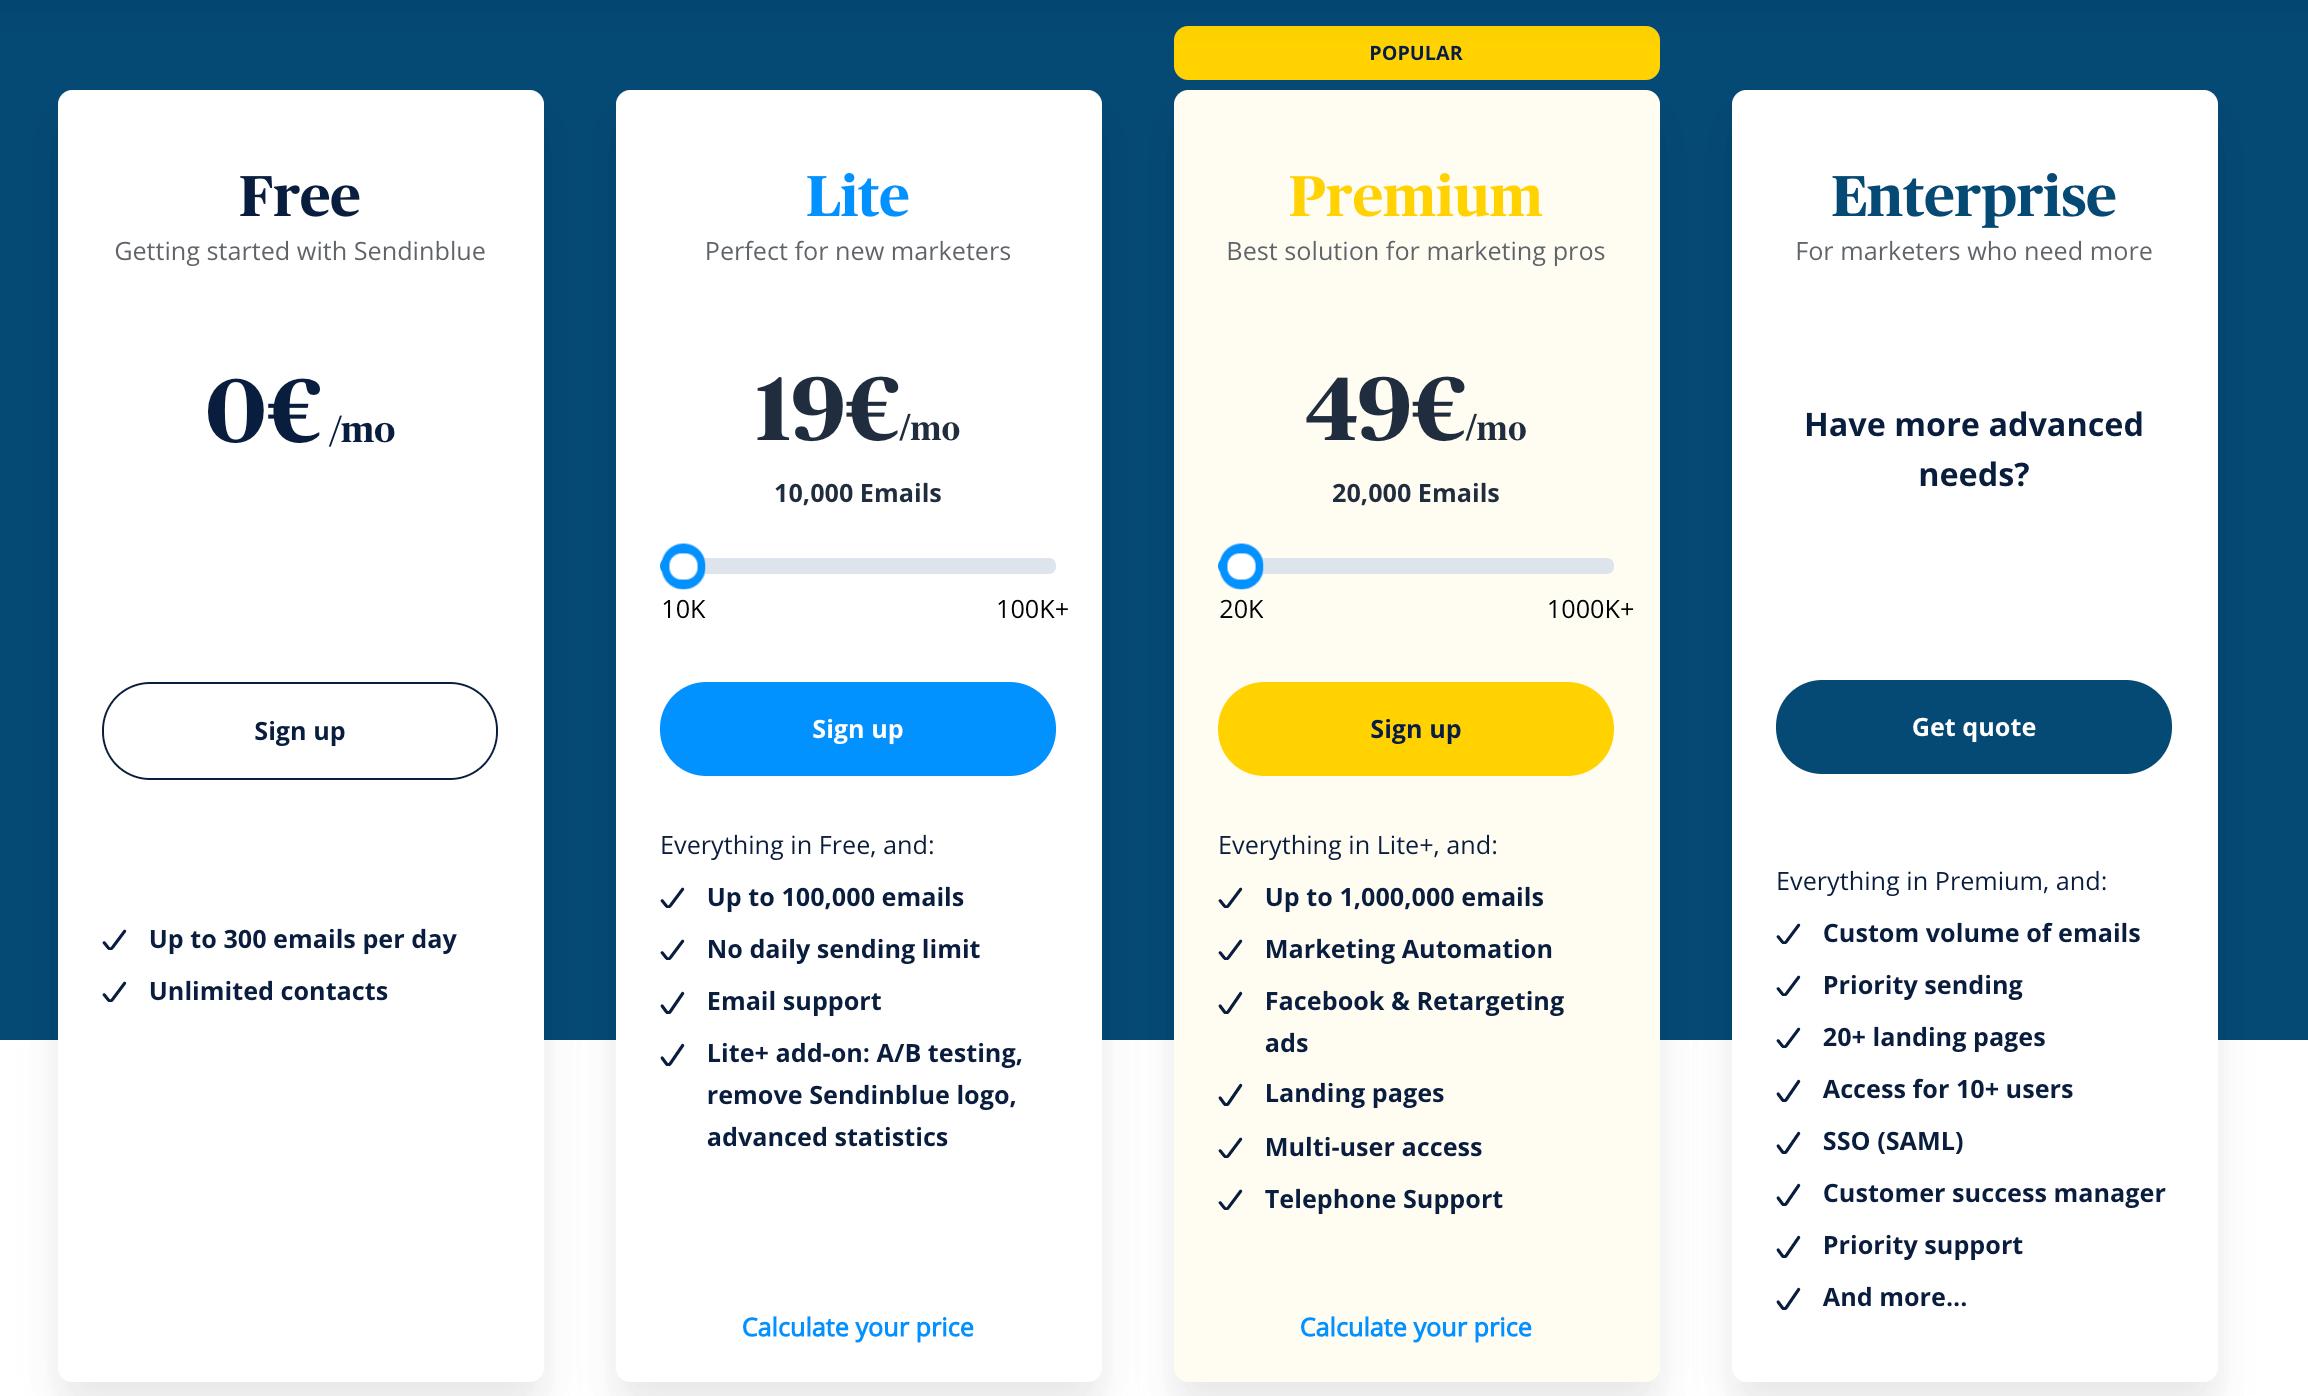 sendinblue pricing, a marketing automation tool